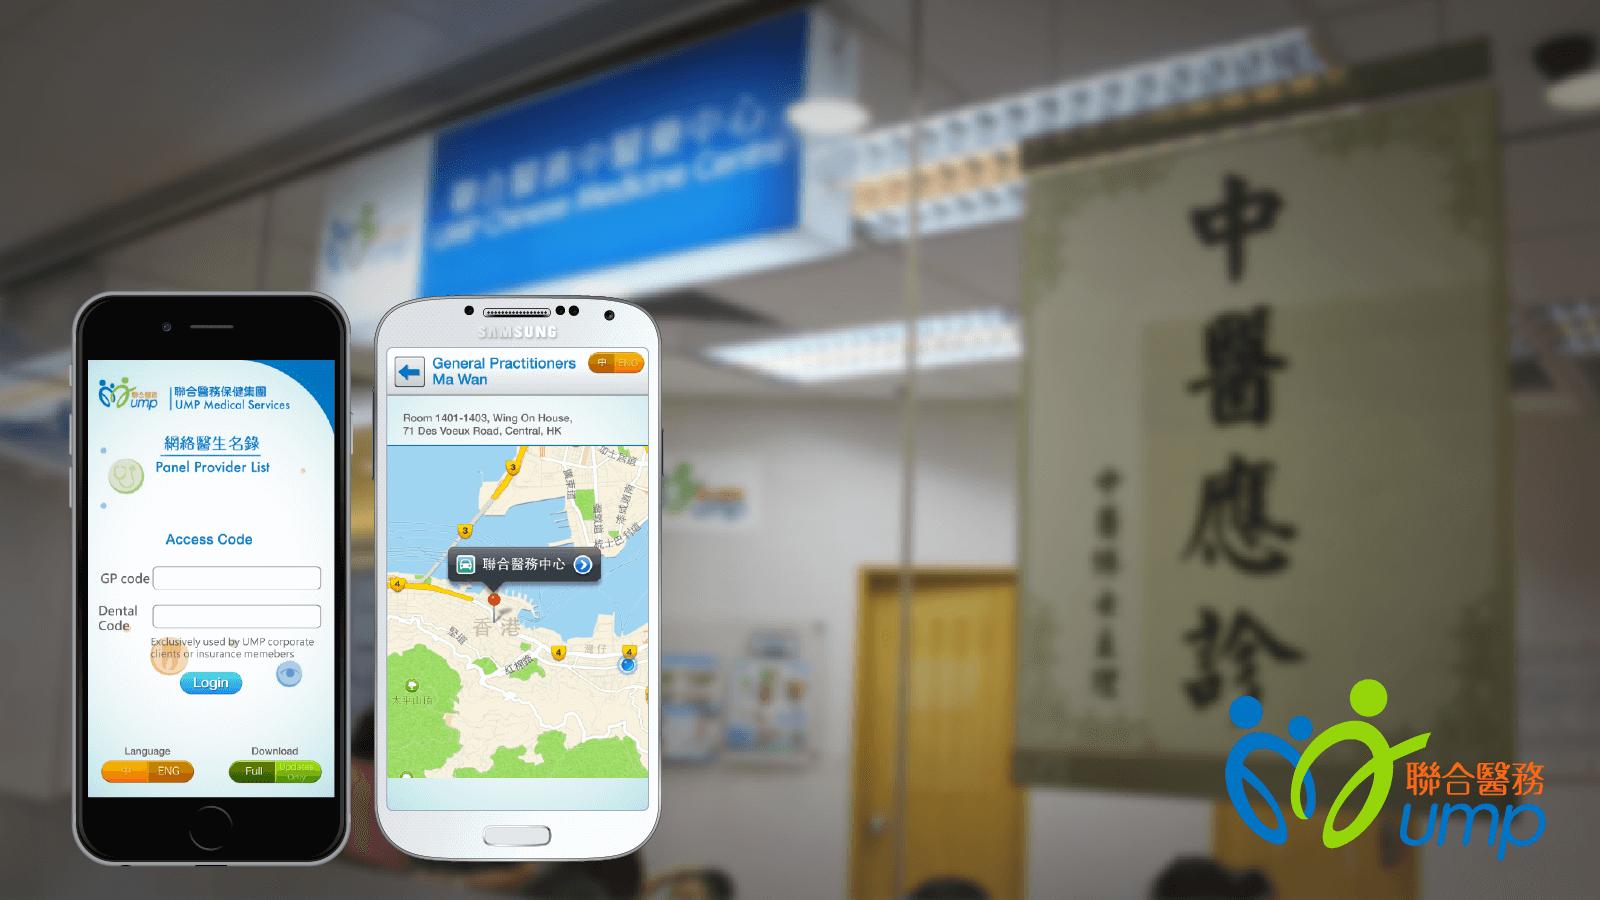 ump service point - legato - mobile app design company iphone